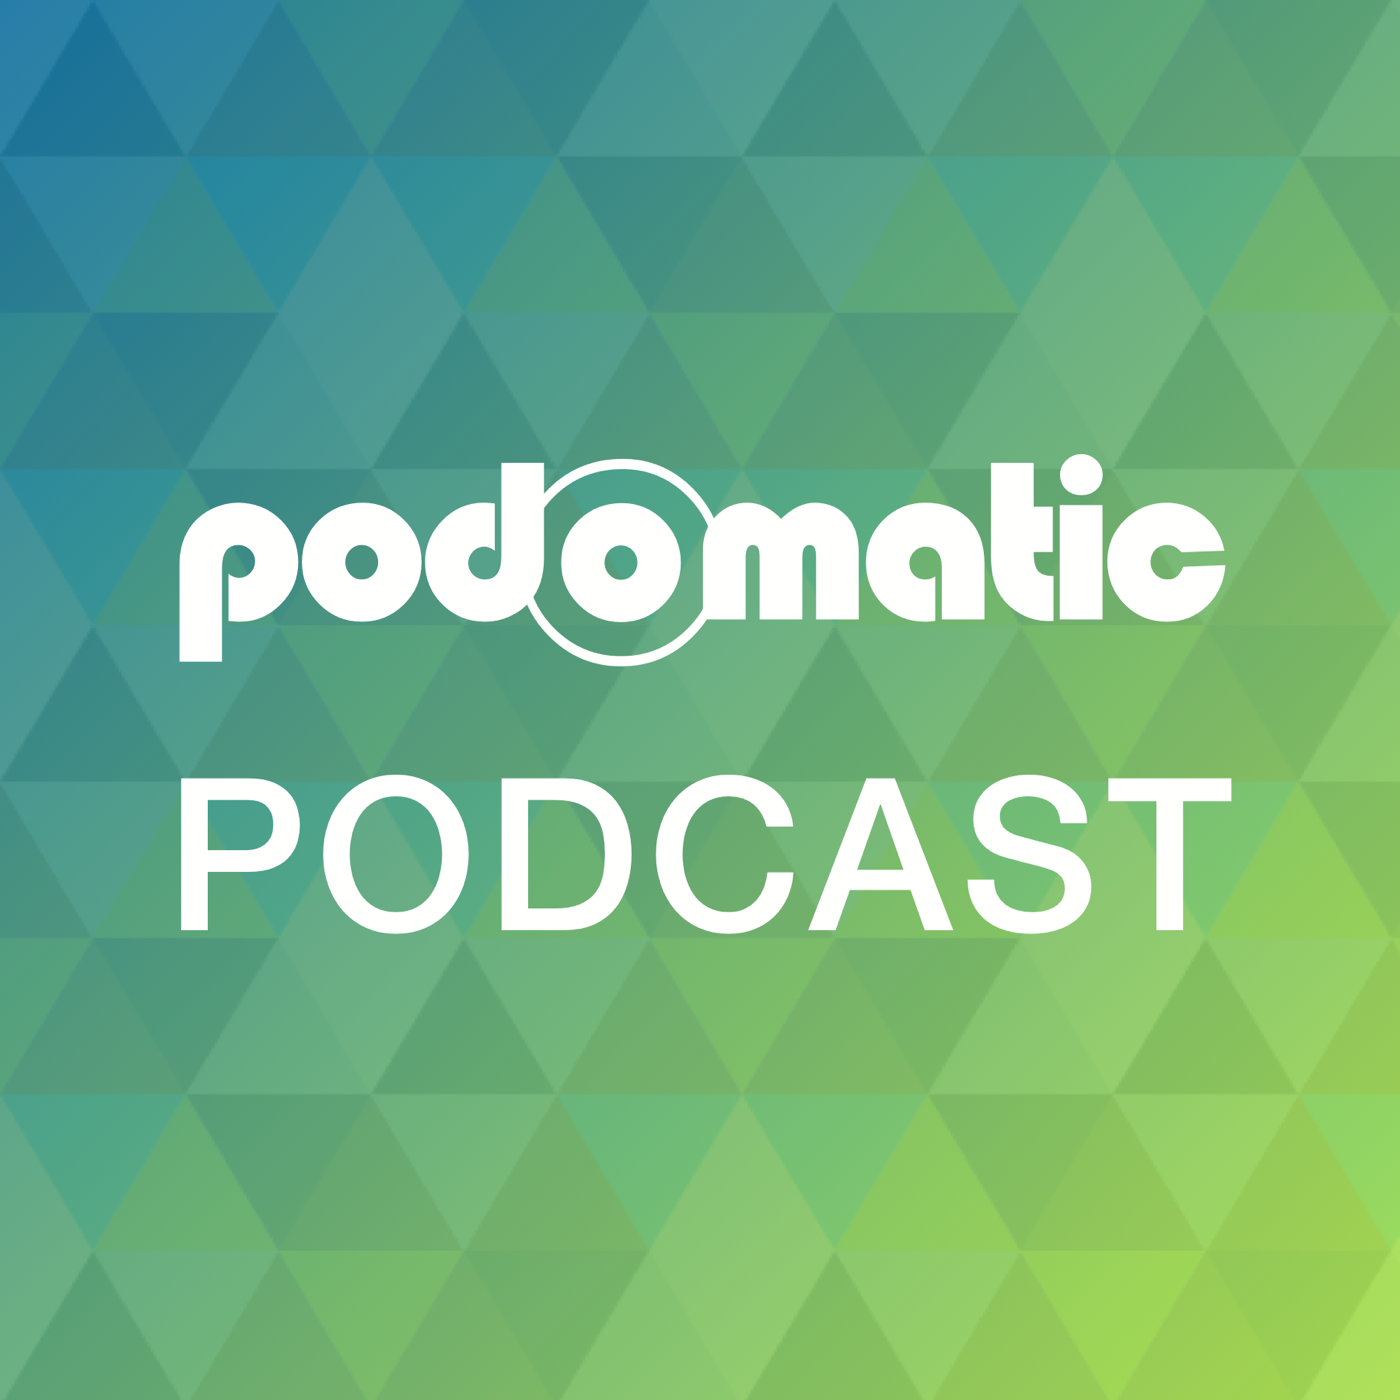 adriana rangel's Podcast